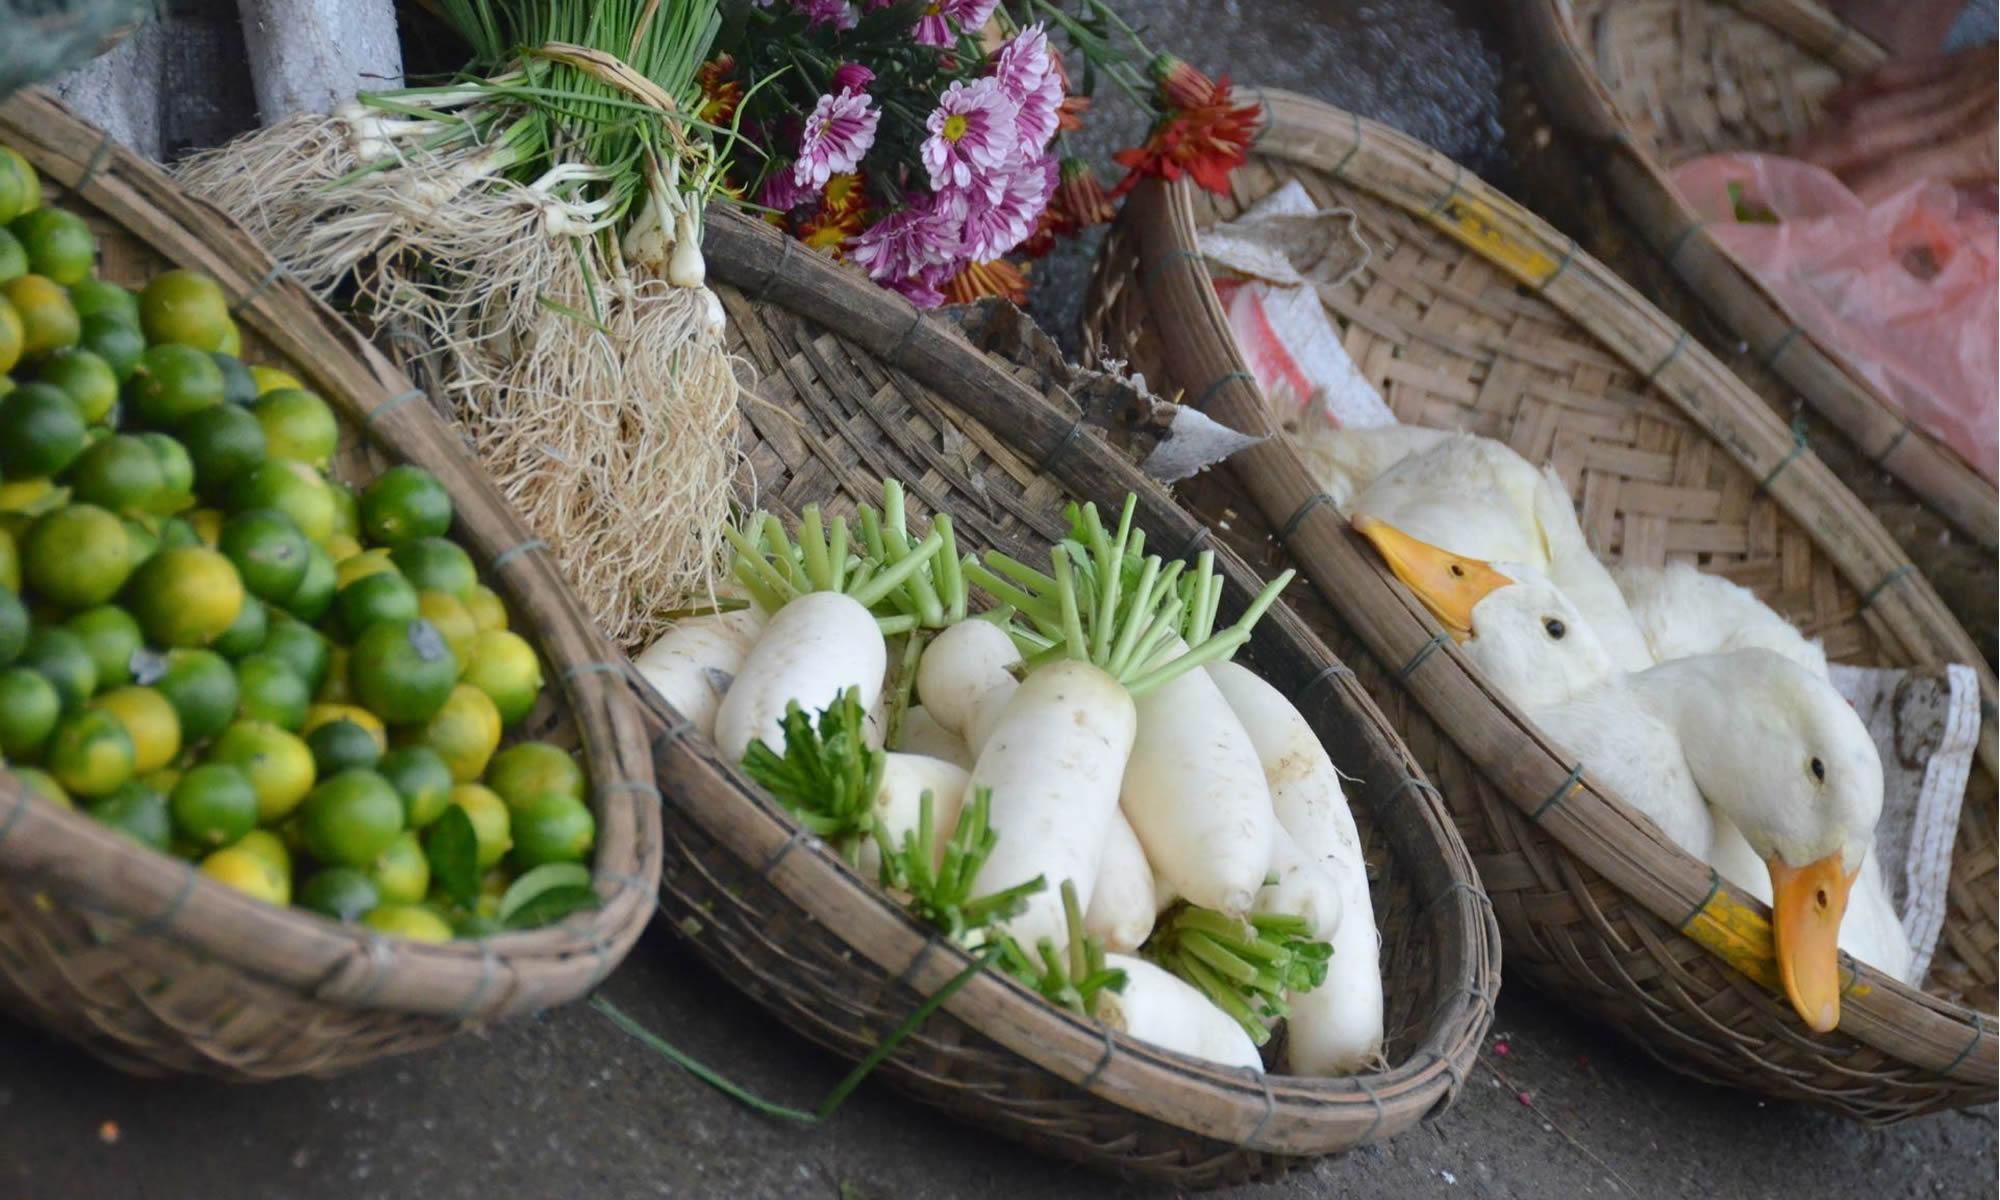 To Market, To Market: Scenes From Vietnam